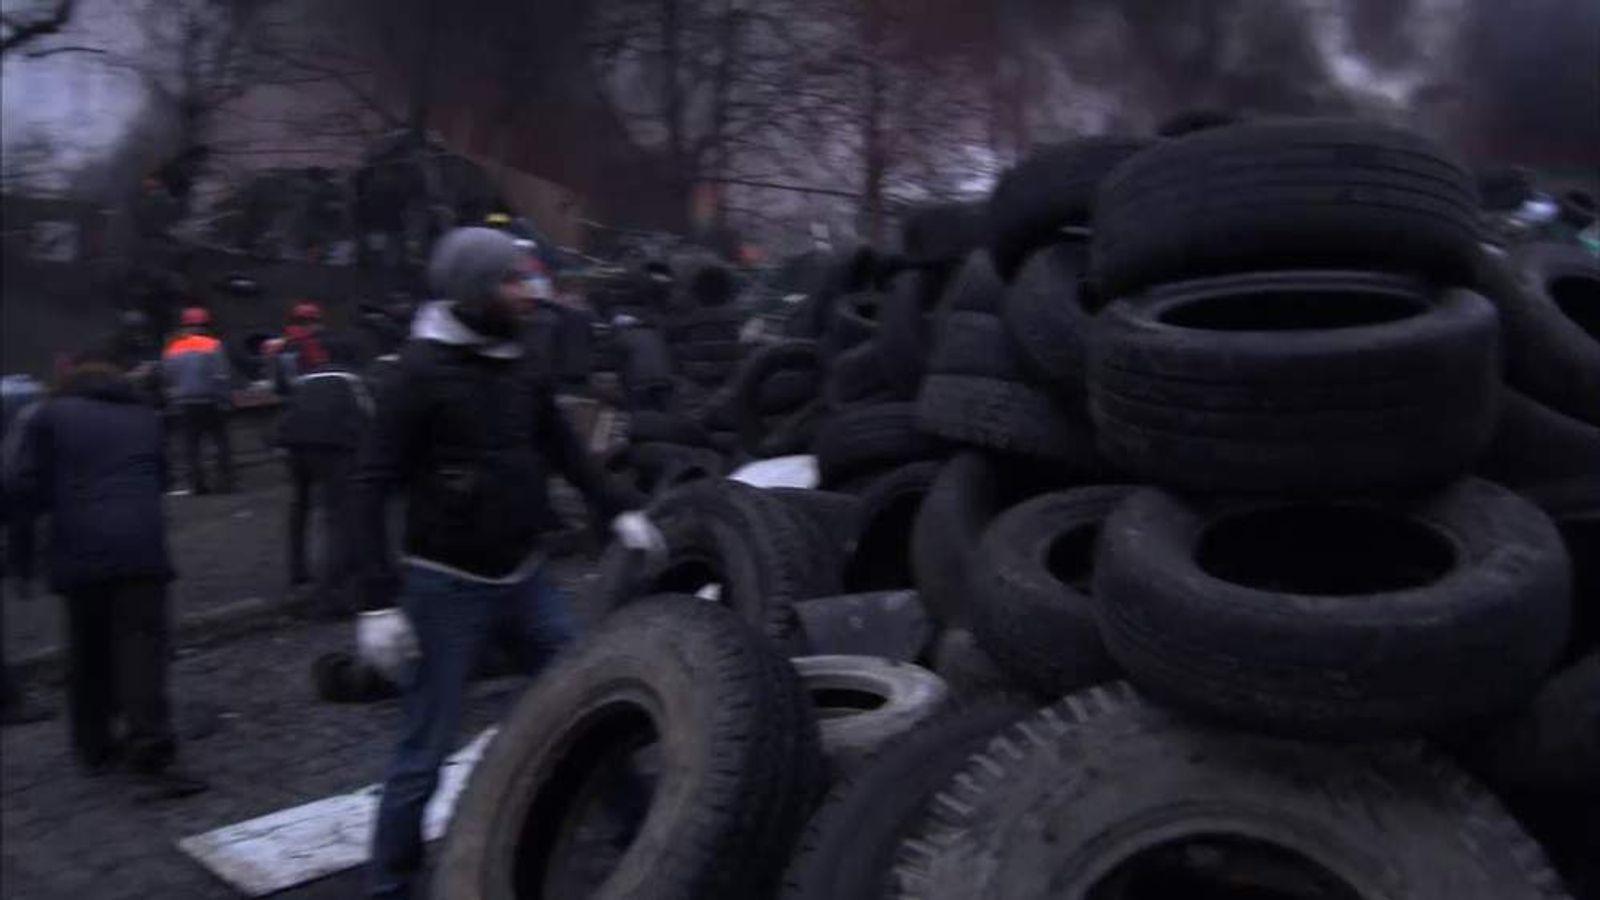 Behind The Barricades